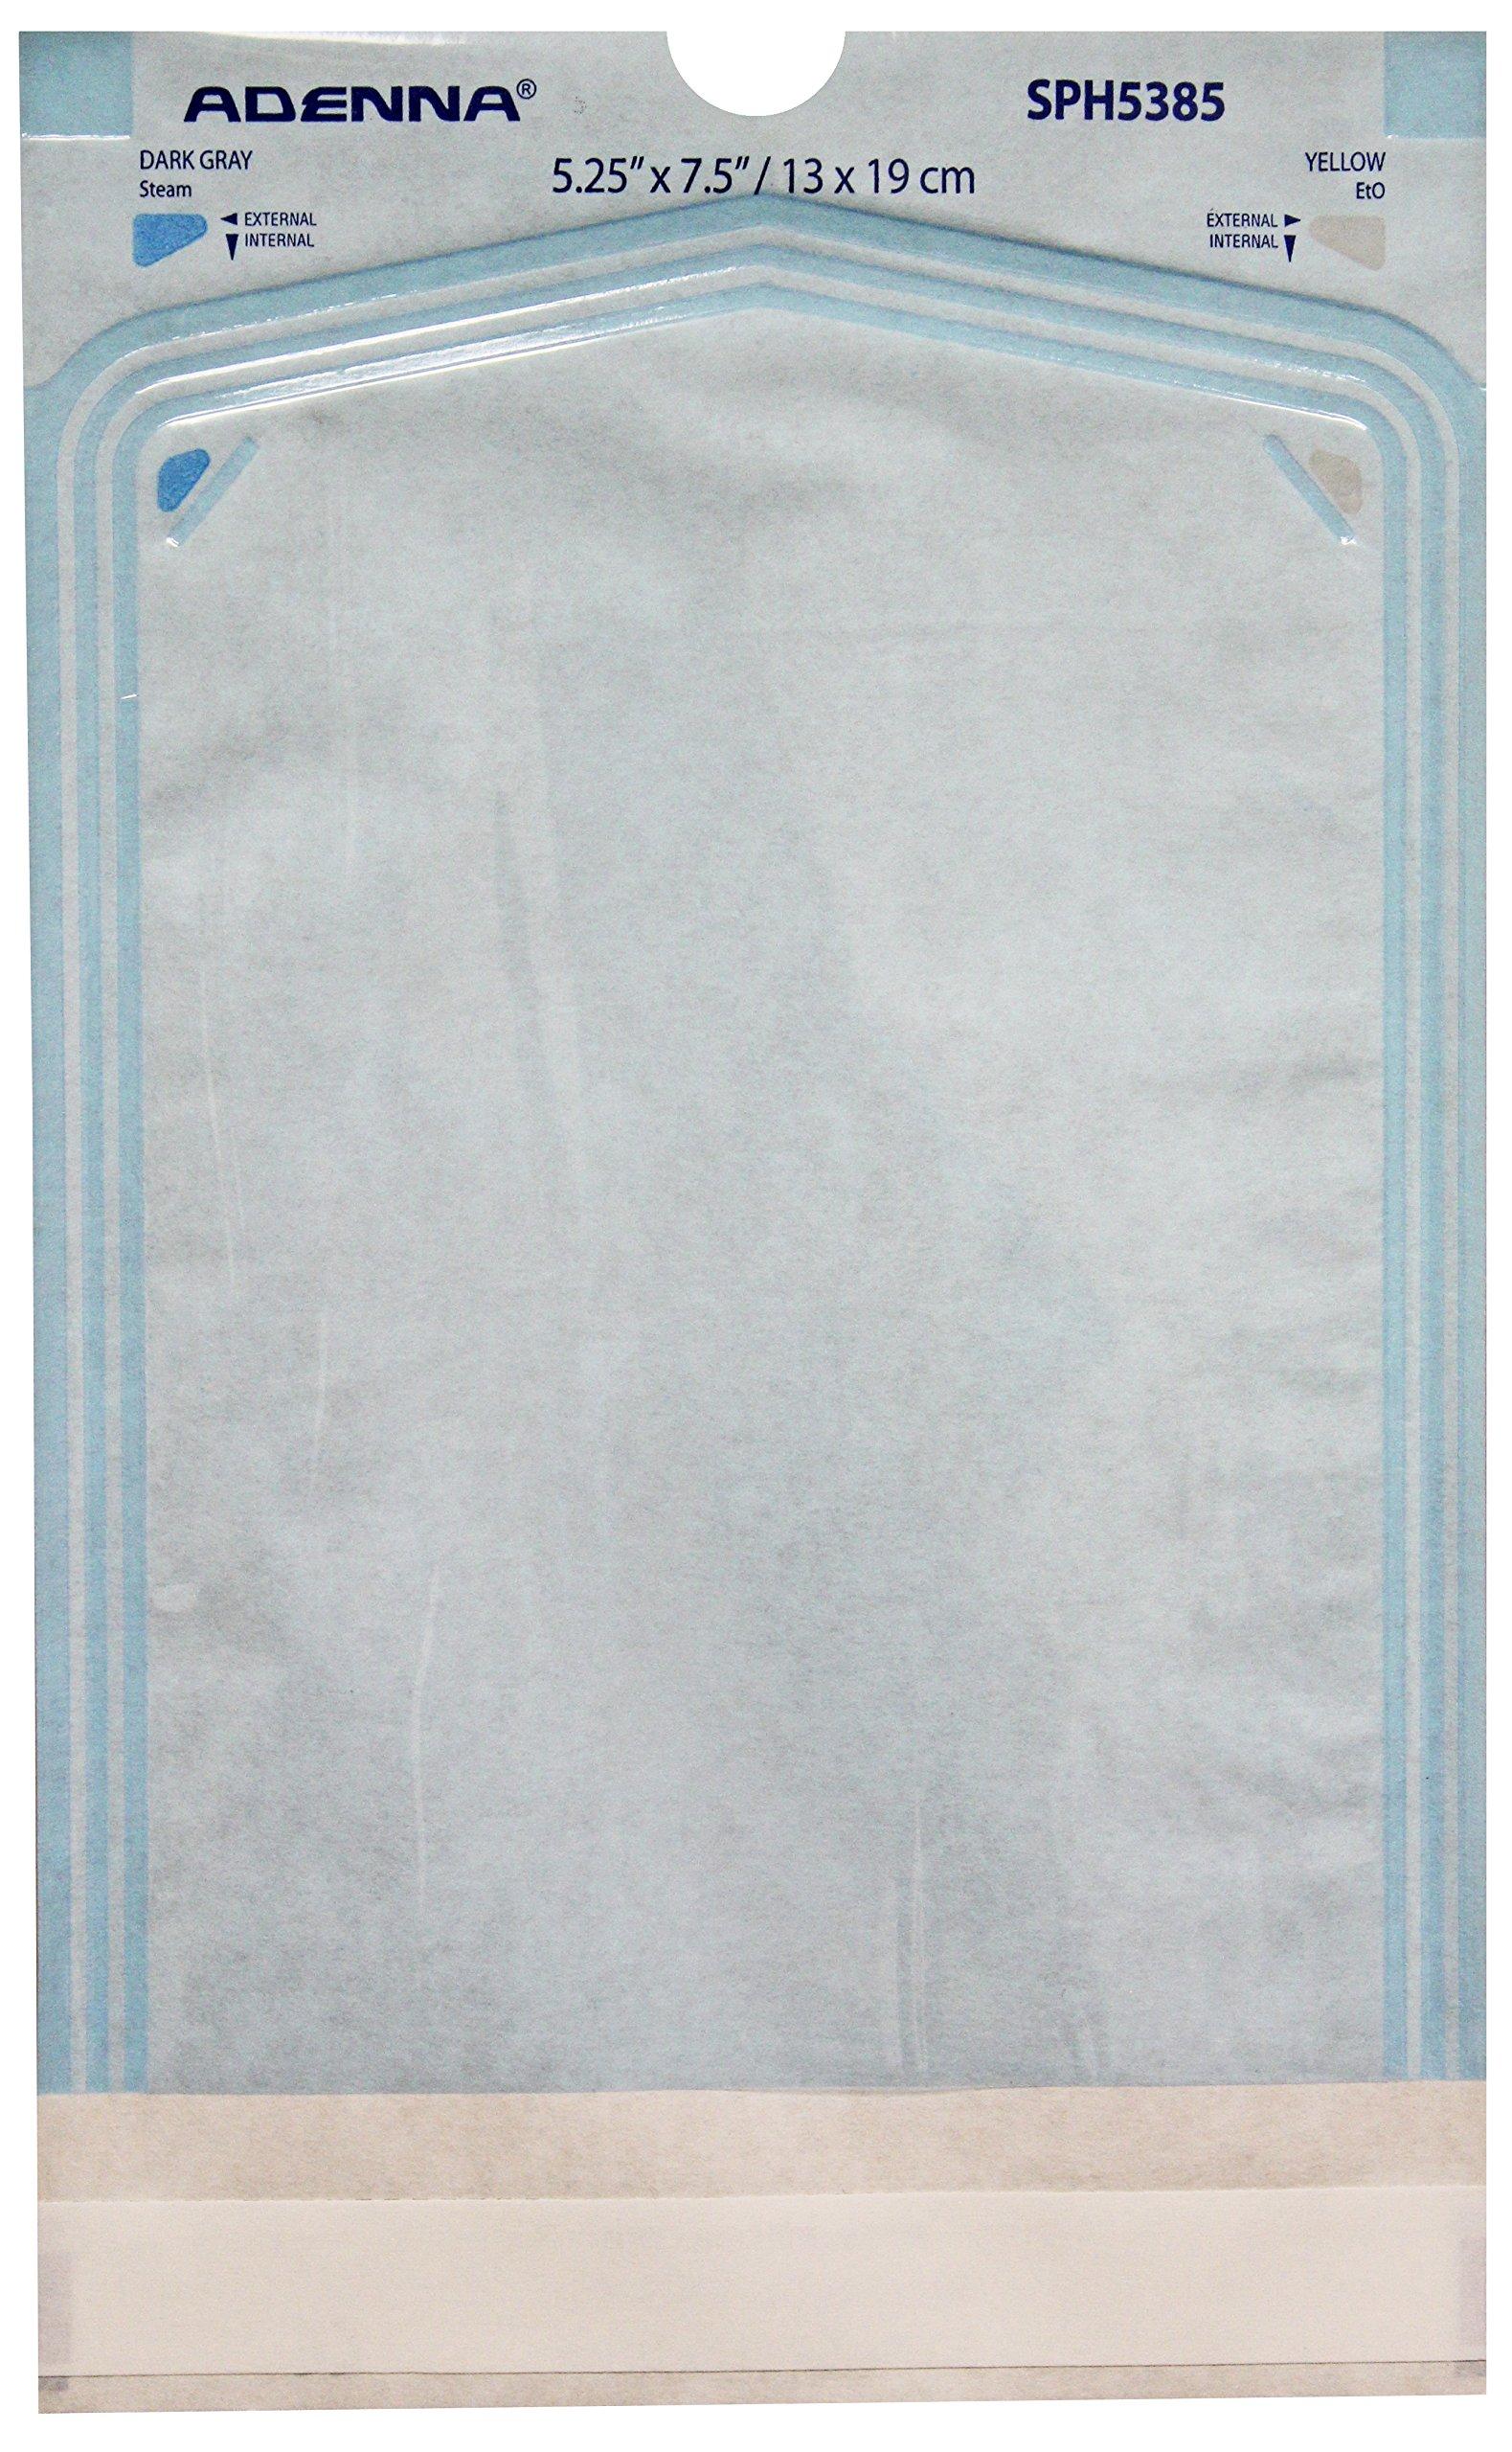 Adenna White Paper/Blue Tinted Film 5-1/4 X 7-1/2 Sterilization Pouch (Box of 200)